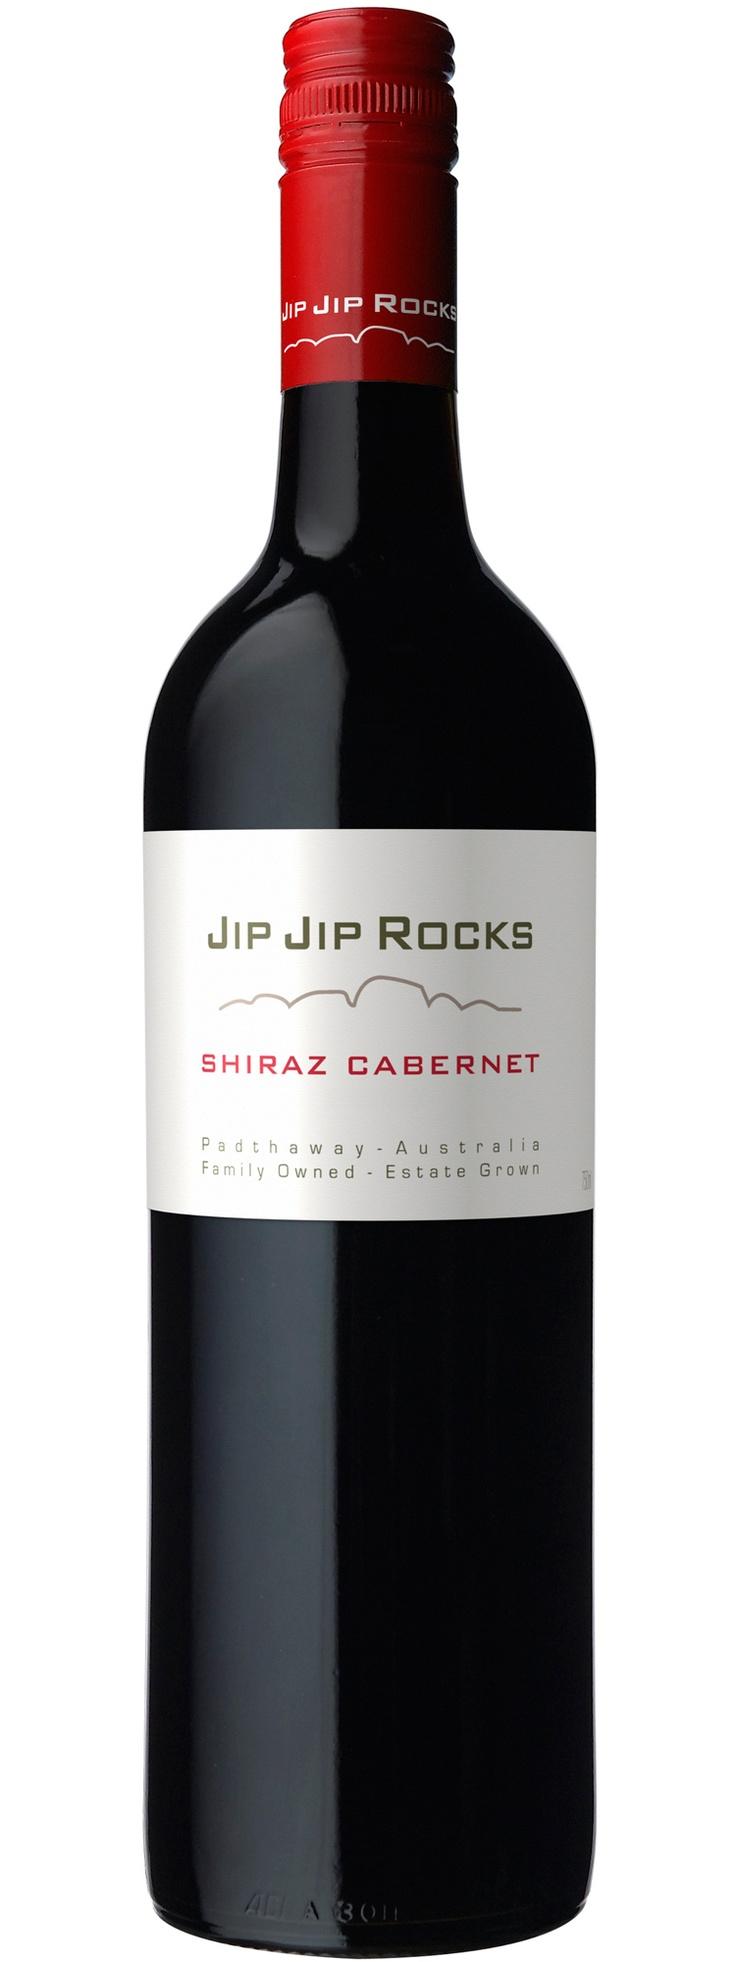 Jip Jip Rocks Shiraz Cabernet | Dan Murphy's | Buy Wine, Champagne, Beer & Spirits Online